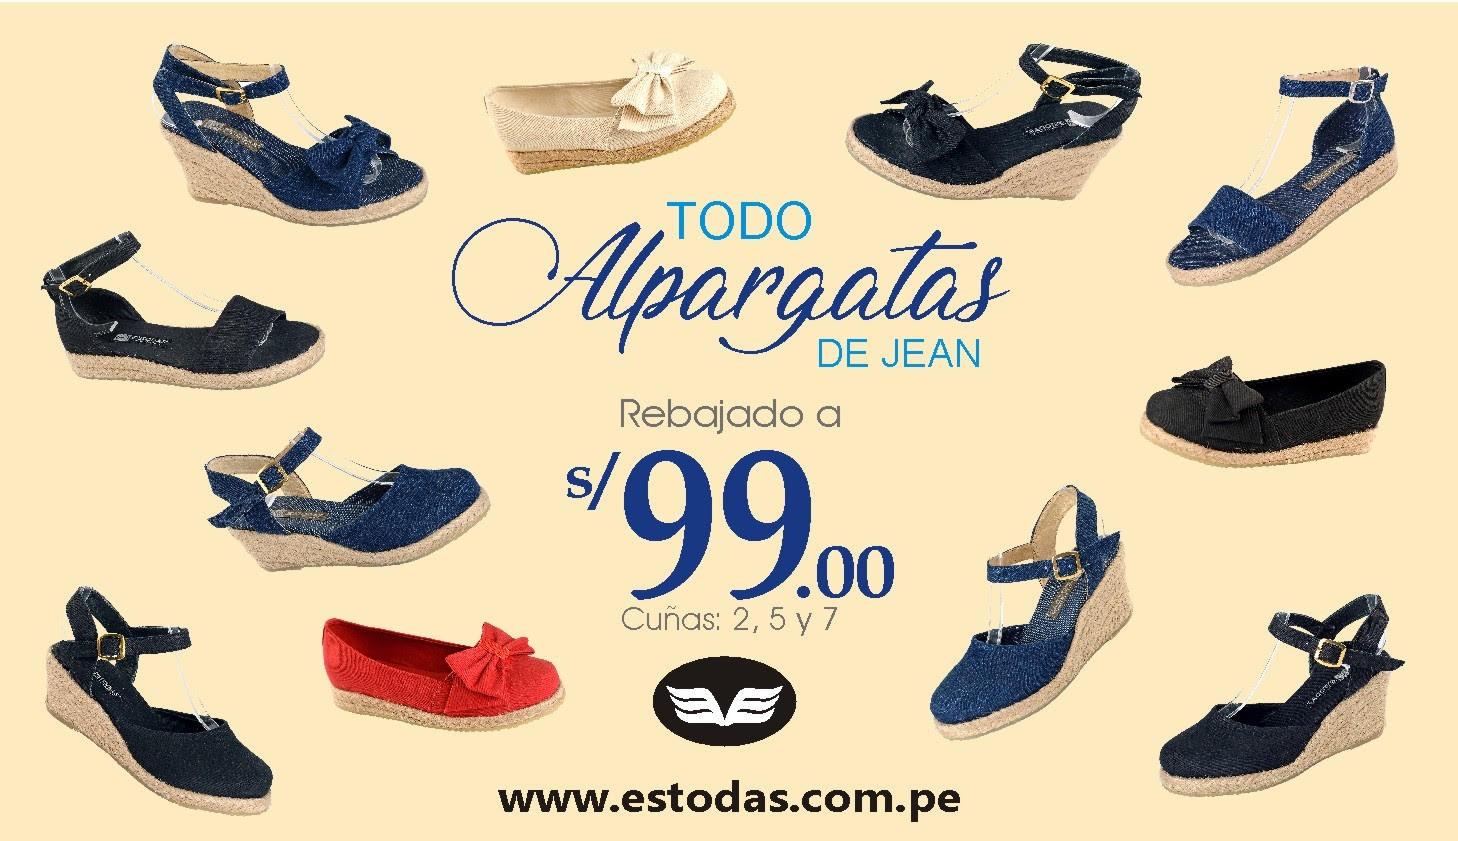 Especial Alpargatas